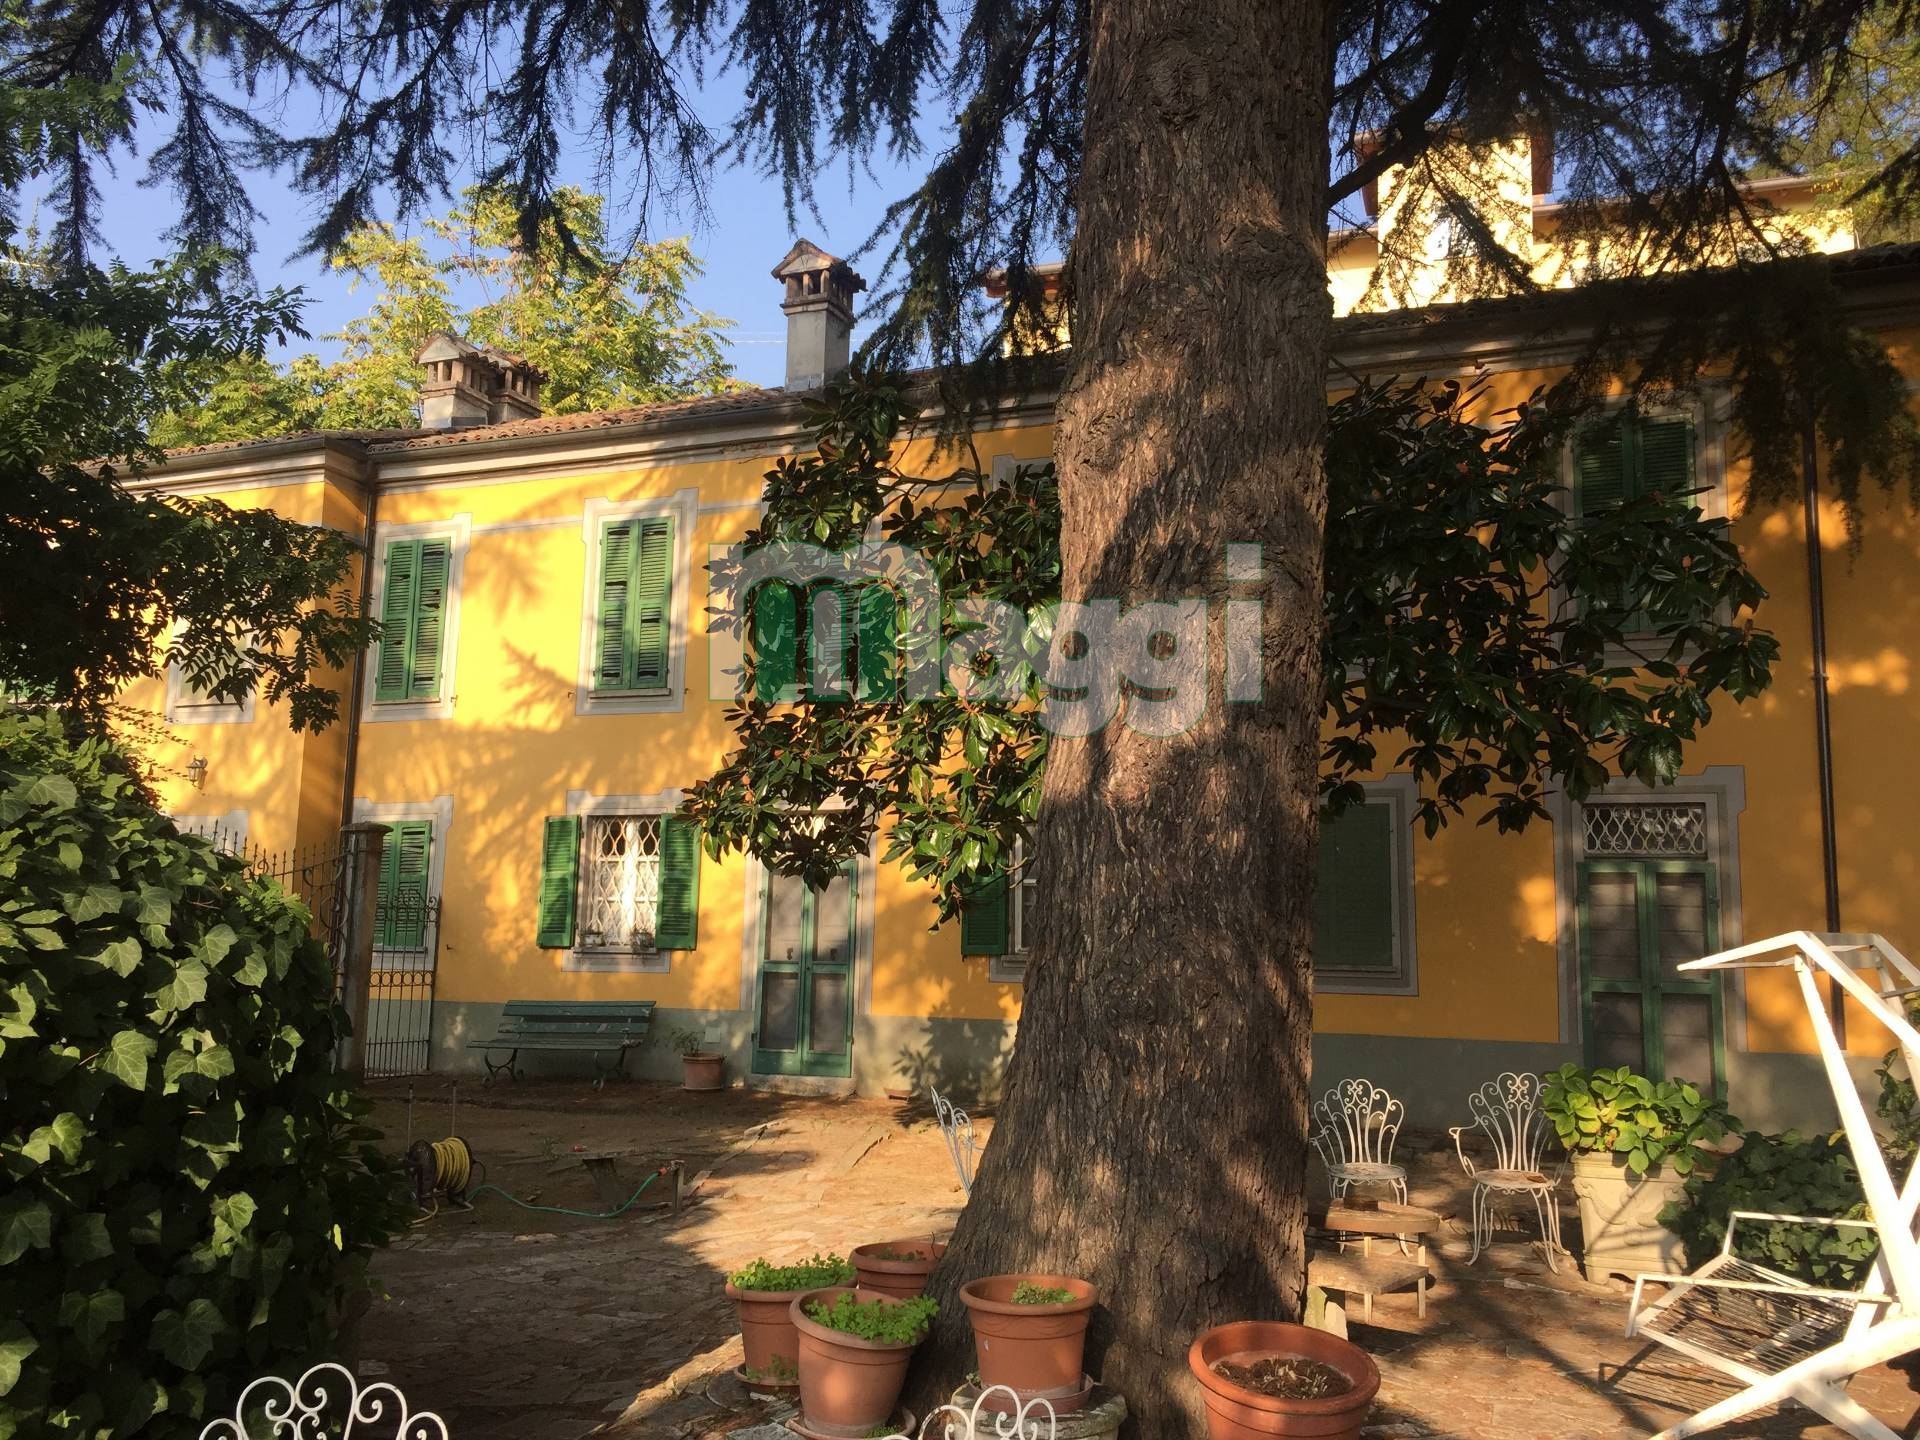 Casa indipendente in Vendita a Tortona: 5 locali, 250 mq